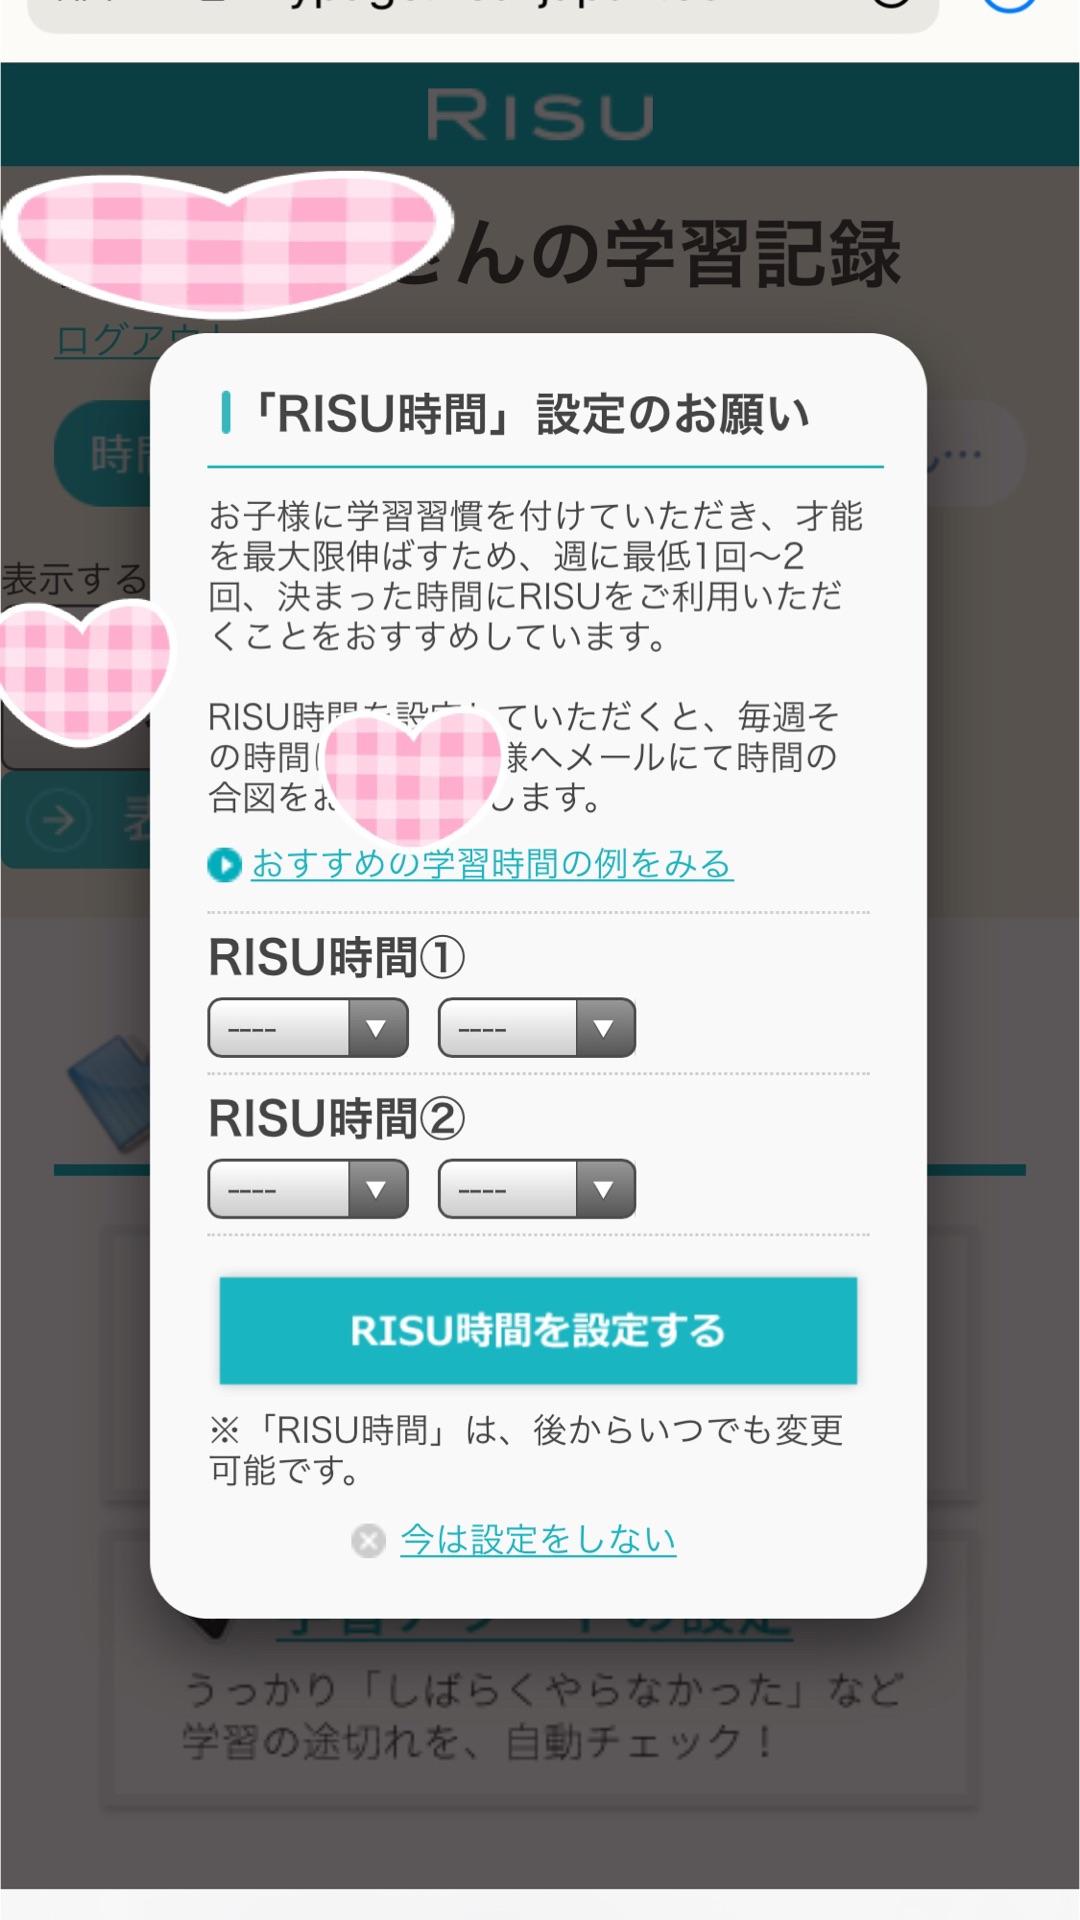 RISU算数,リス算数,お試し,オンライン教材,タブレット教材,通信教材,RISU